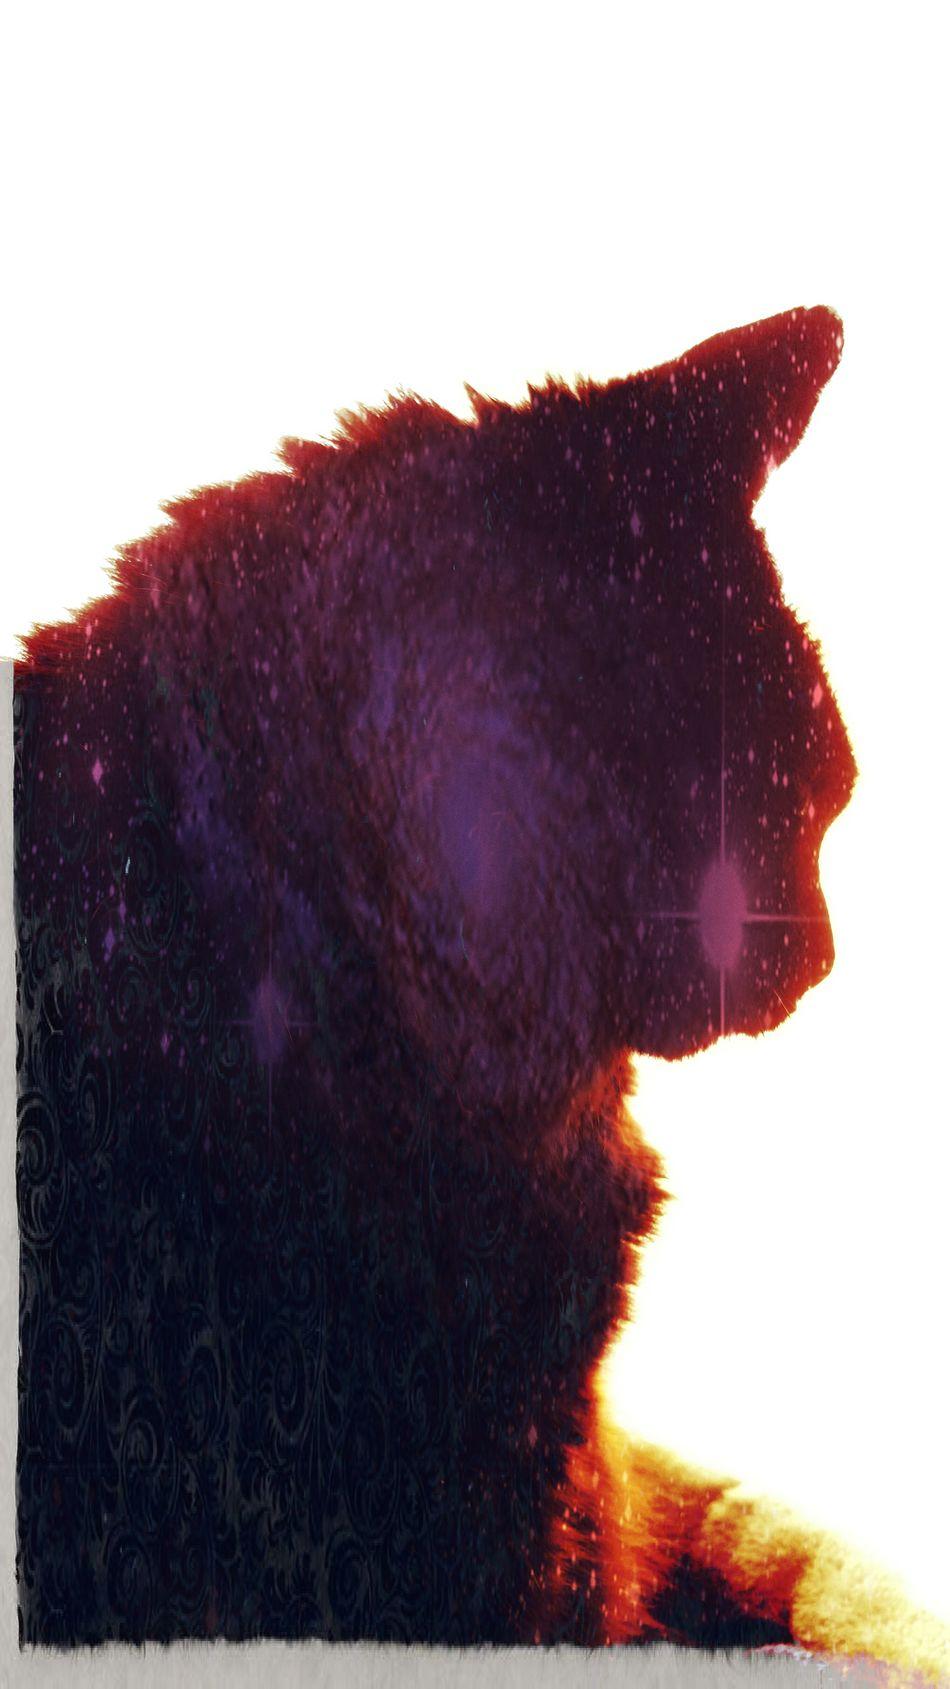 Cat BLackCat Edit Profile Sparkle Crazyediting